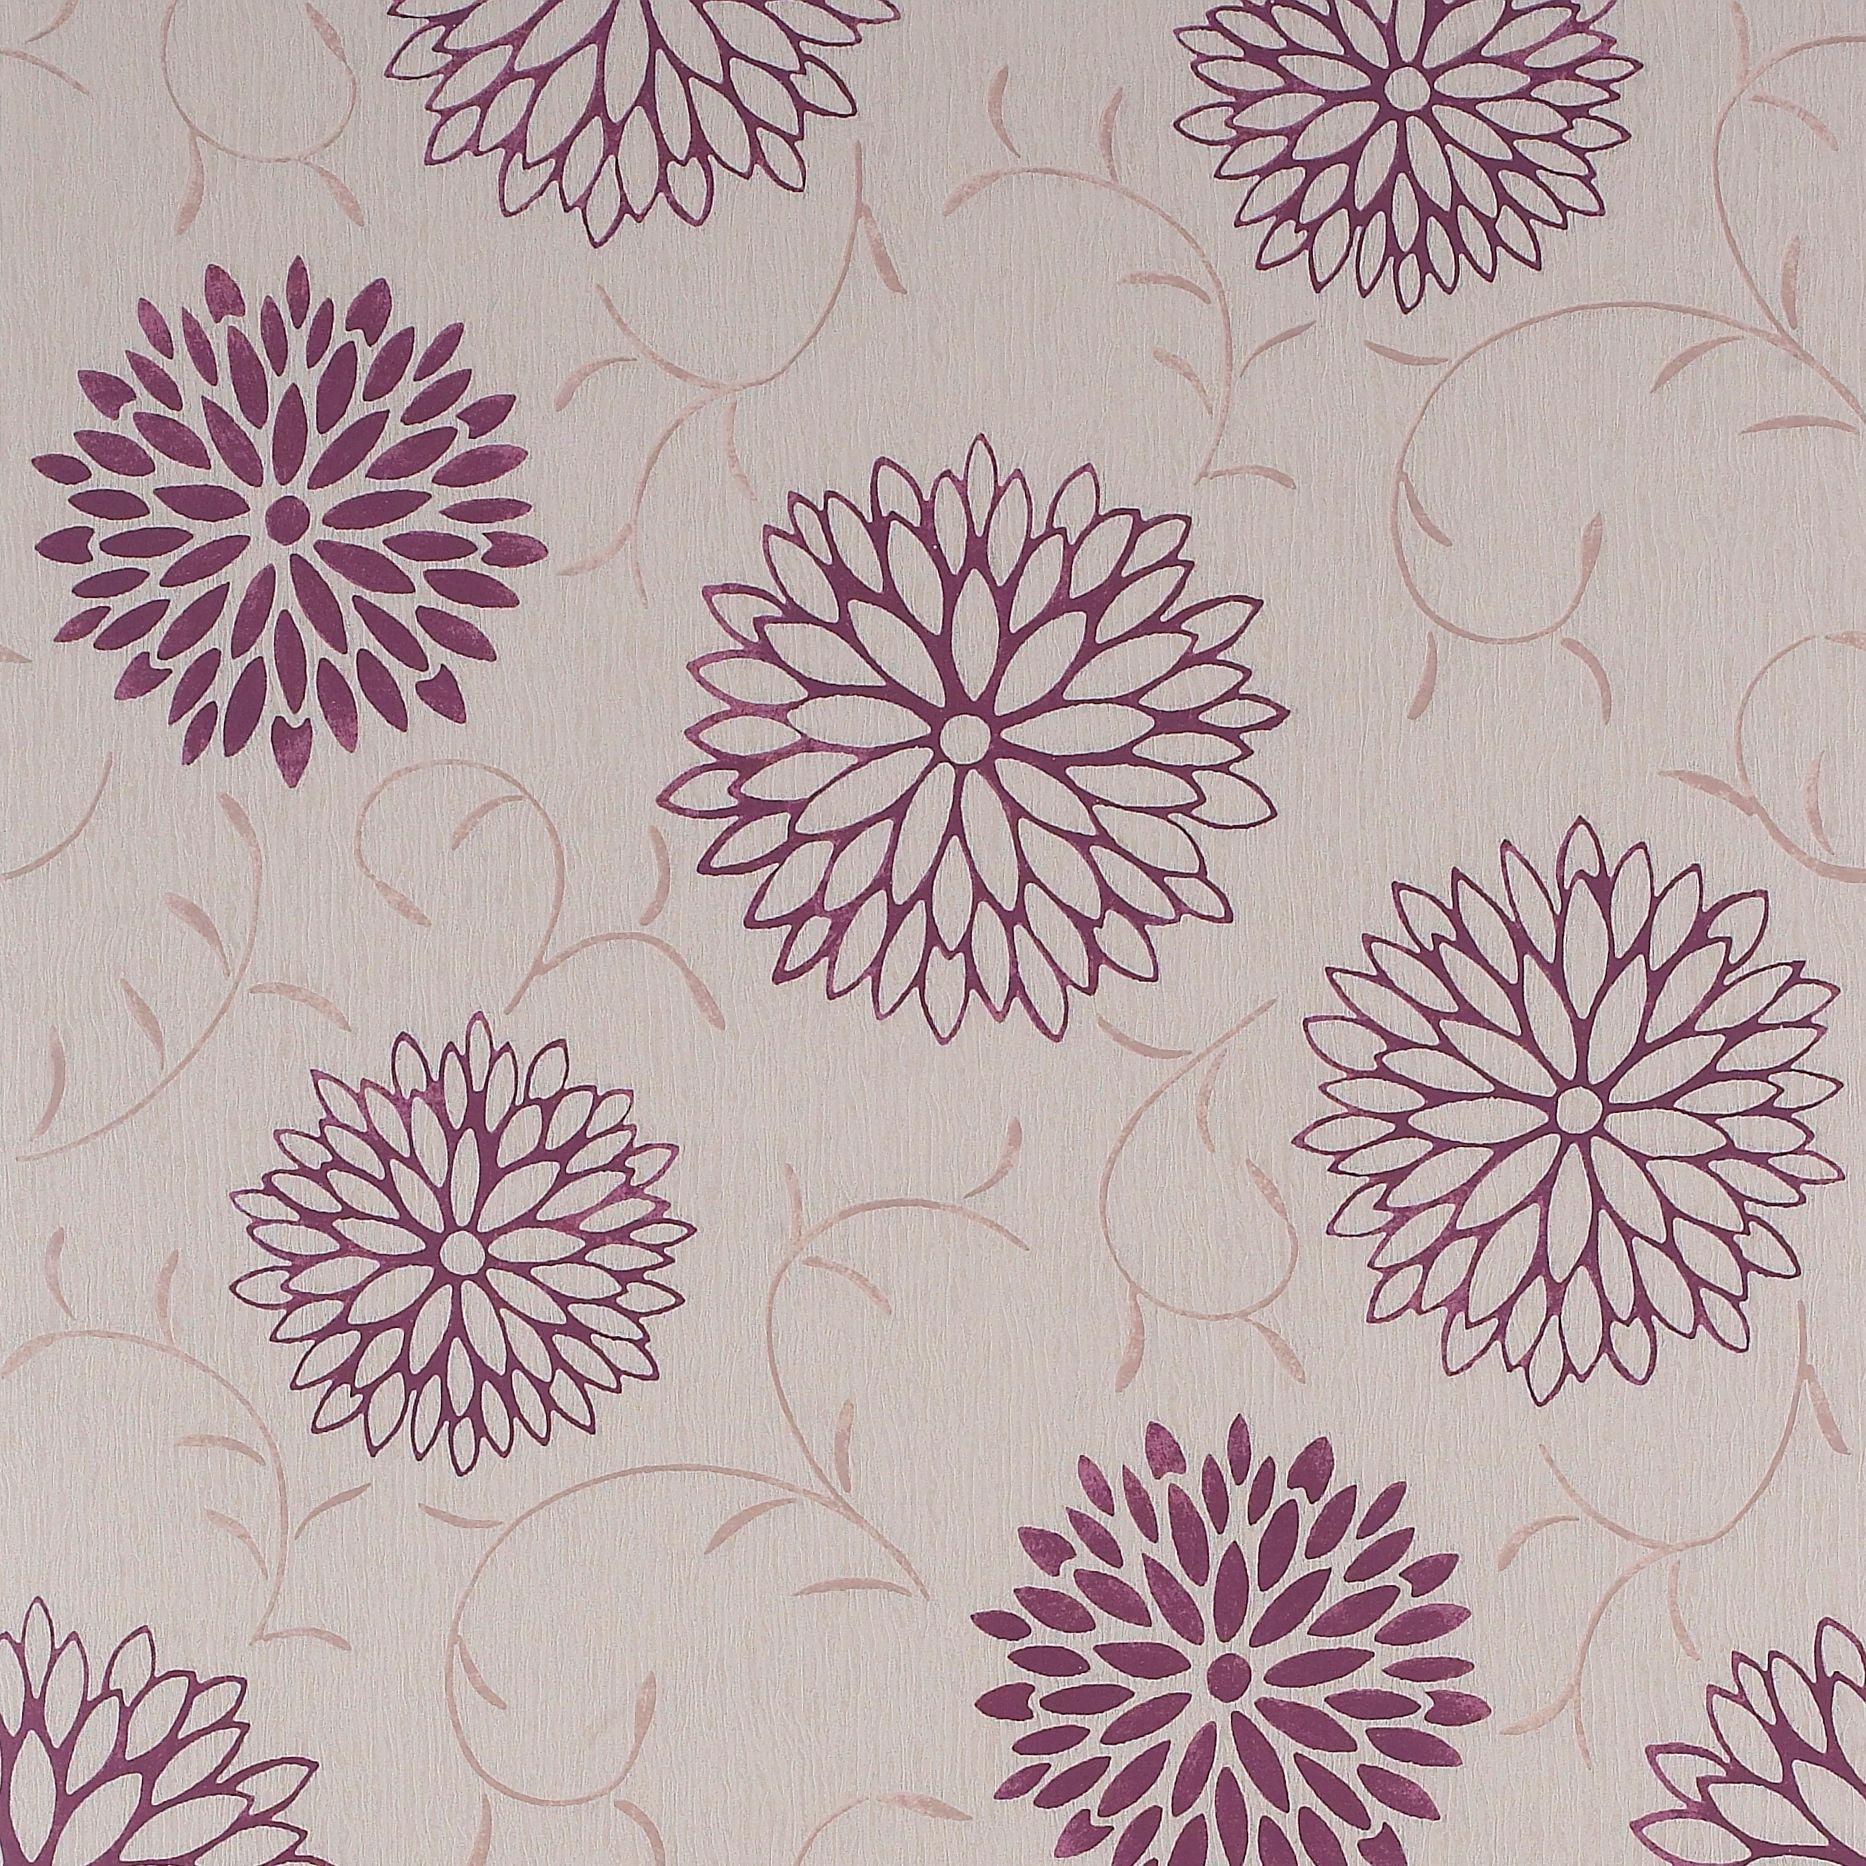 Home diy wallpaper illustration arthouse imagine fern plum motif vinyl - Colours Paste The Wall Romantic Shimmer Effect Raspberry Wallpaper Image 1